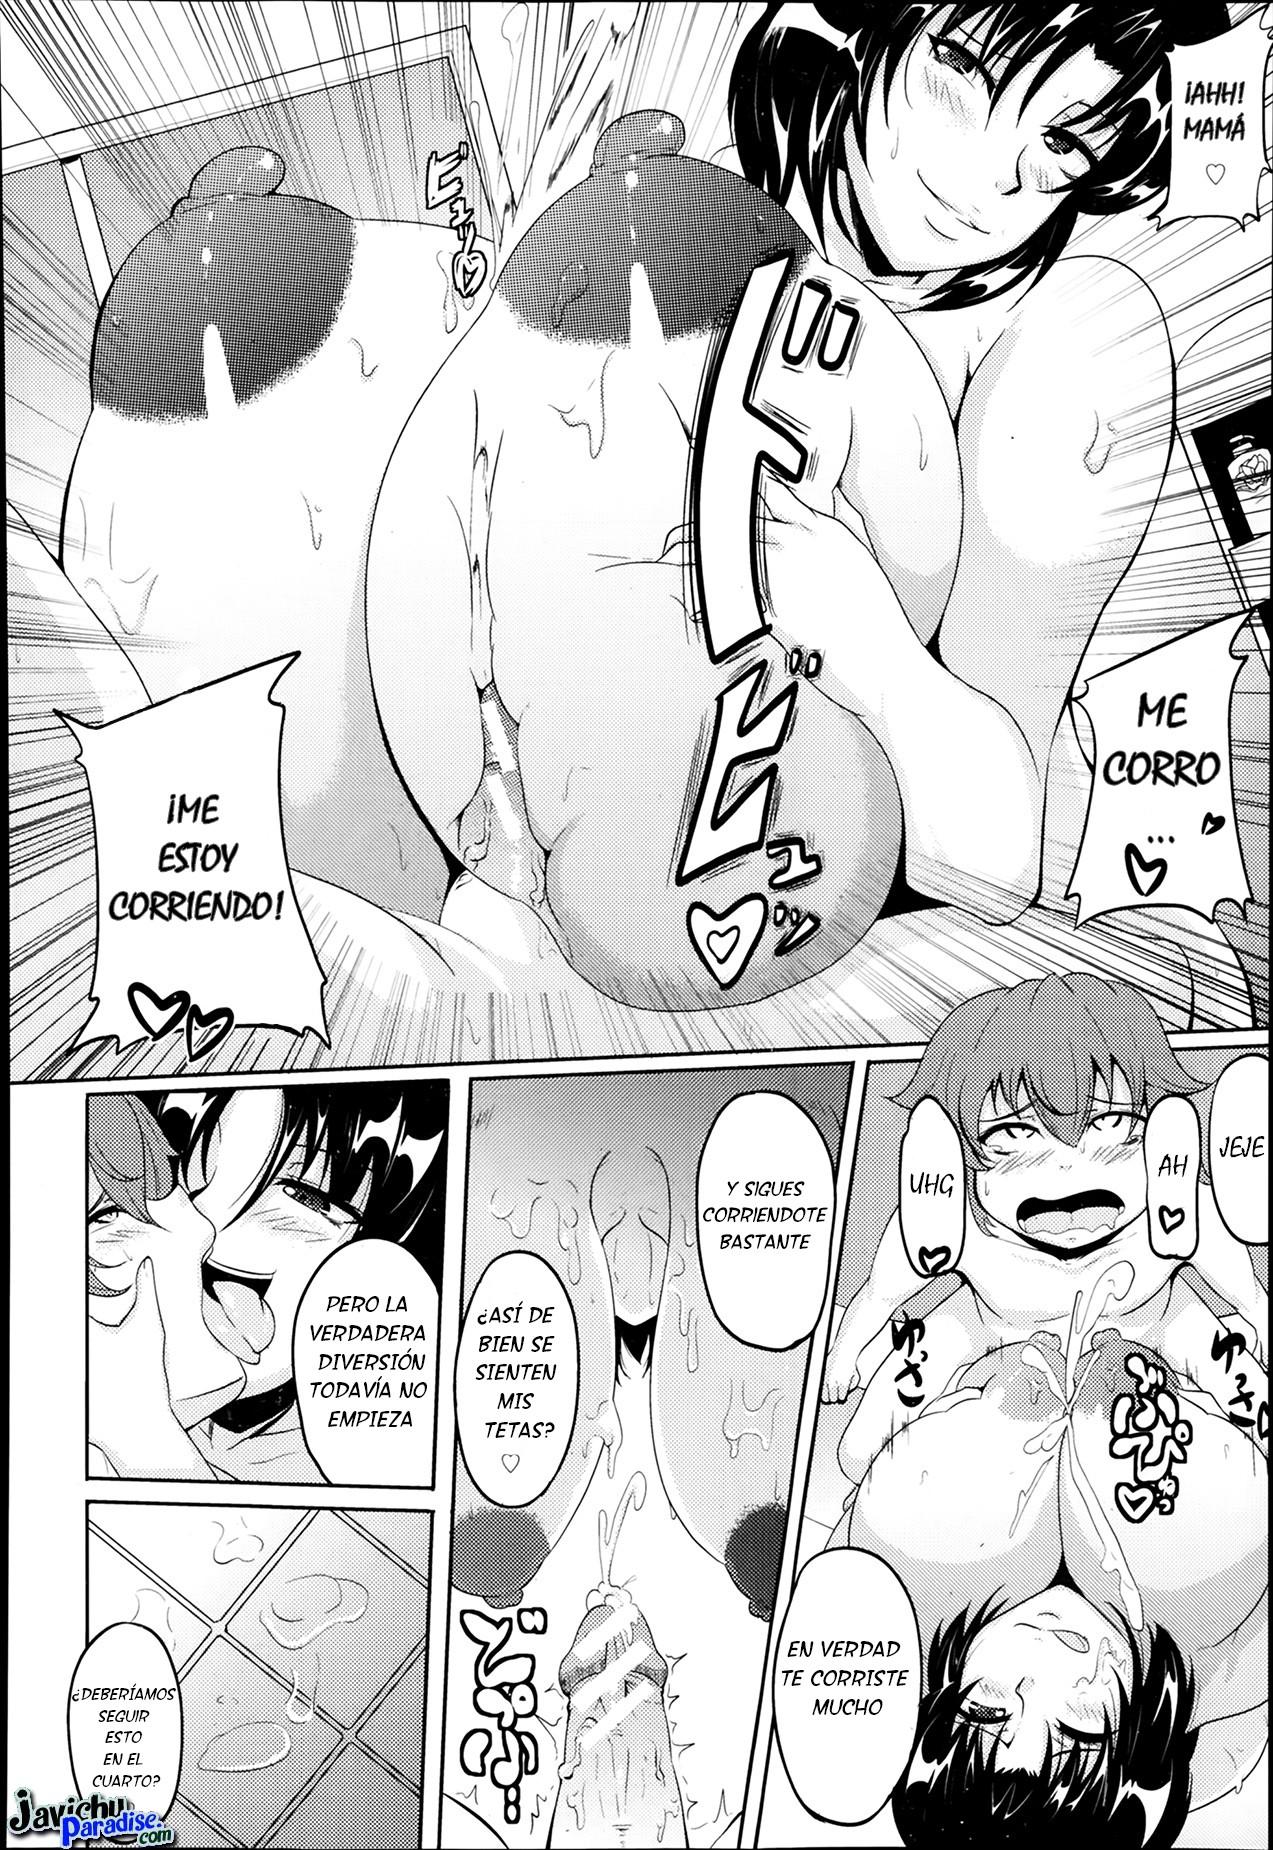 Comics Historietas Porno